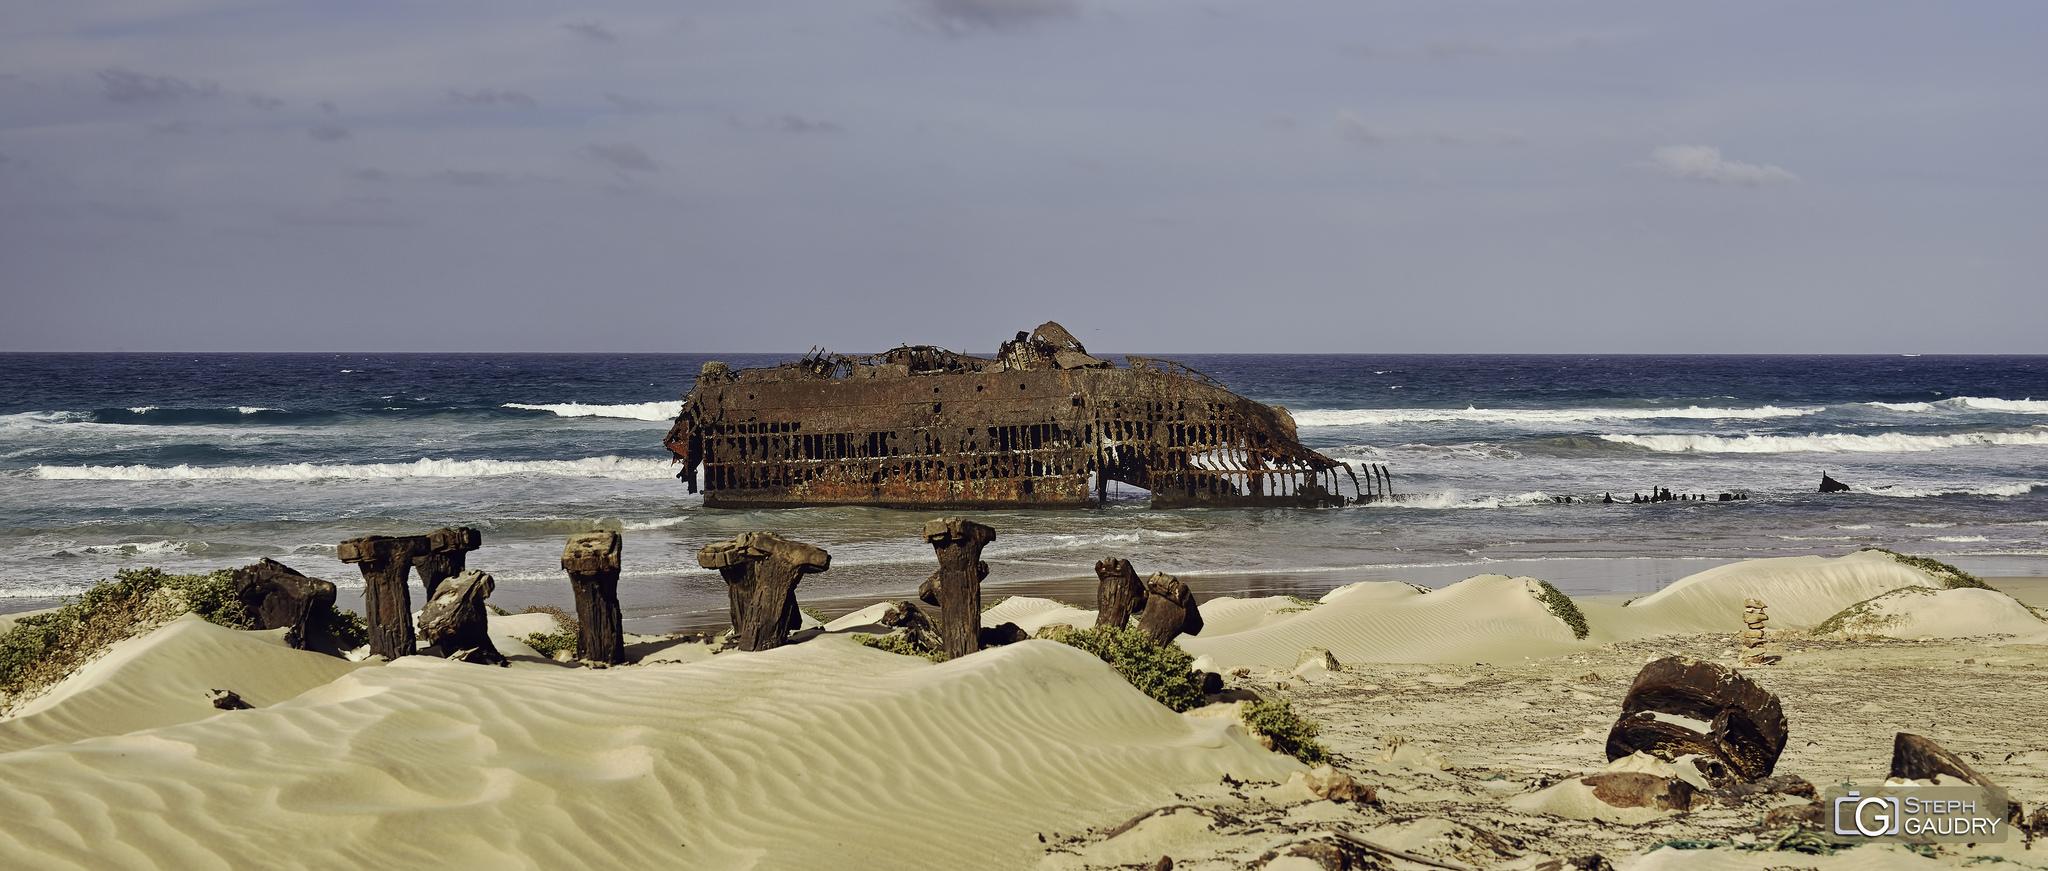 Restes du naufrage du Cabo Santa Maria [Klik om de diavoorstelling te starten]